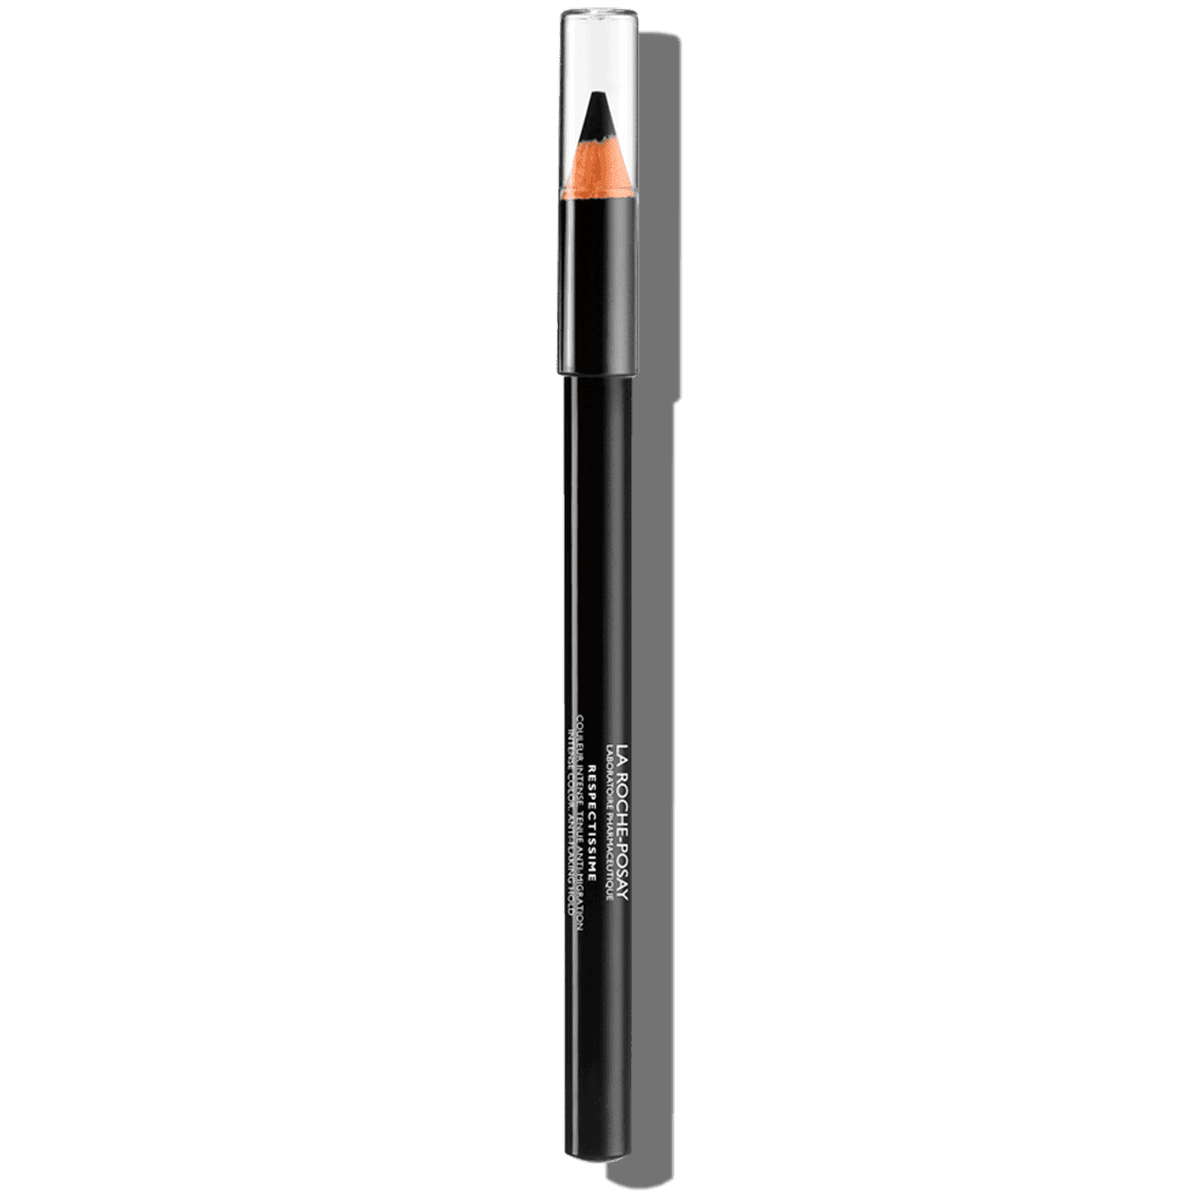 La Roche Posay Herkkä Toleriane Make up EYE PENCIL Black 3337872410